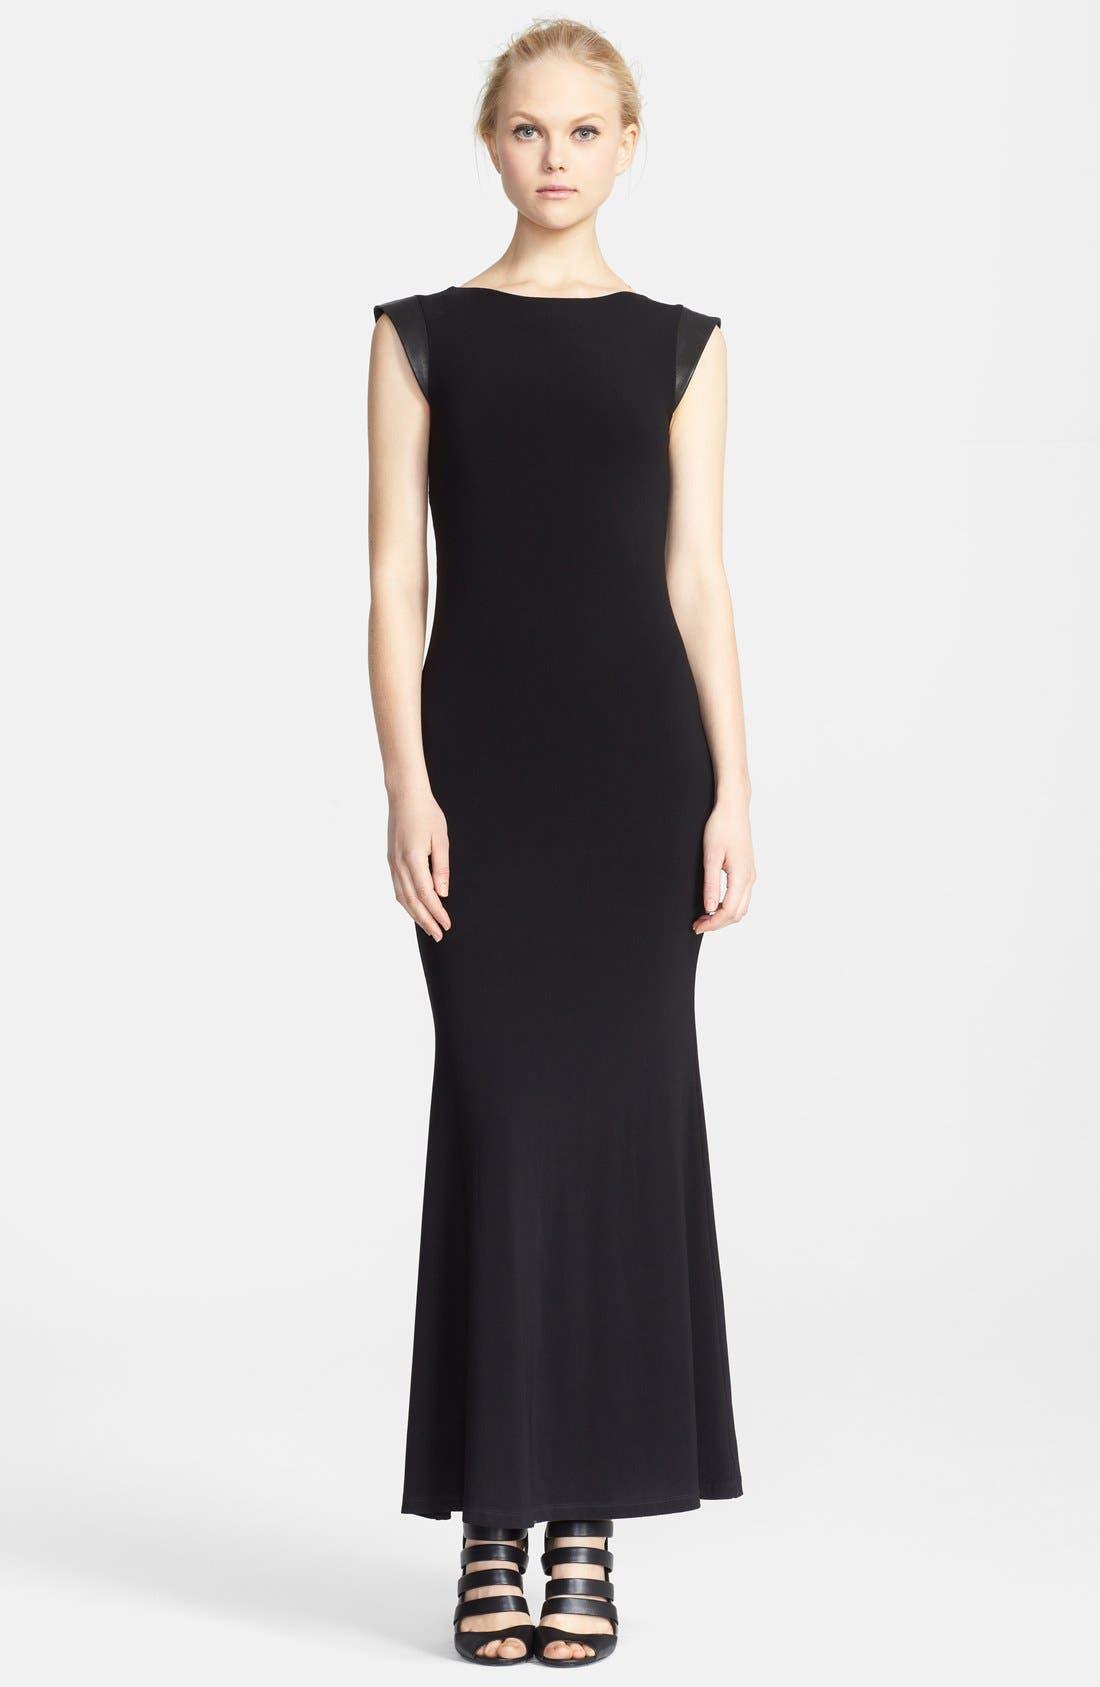 Alternate Image 1 Selected - Alice + Olivia Leather Trim Cutout Back Maxi Dress